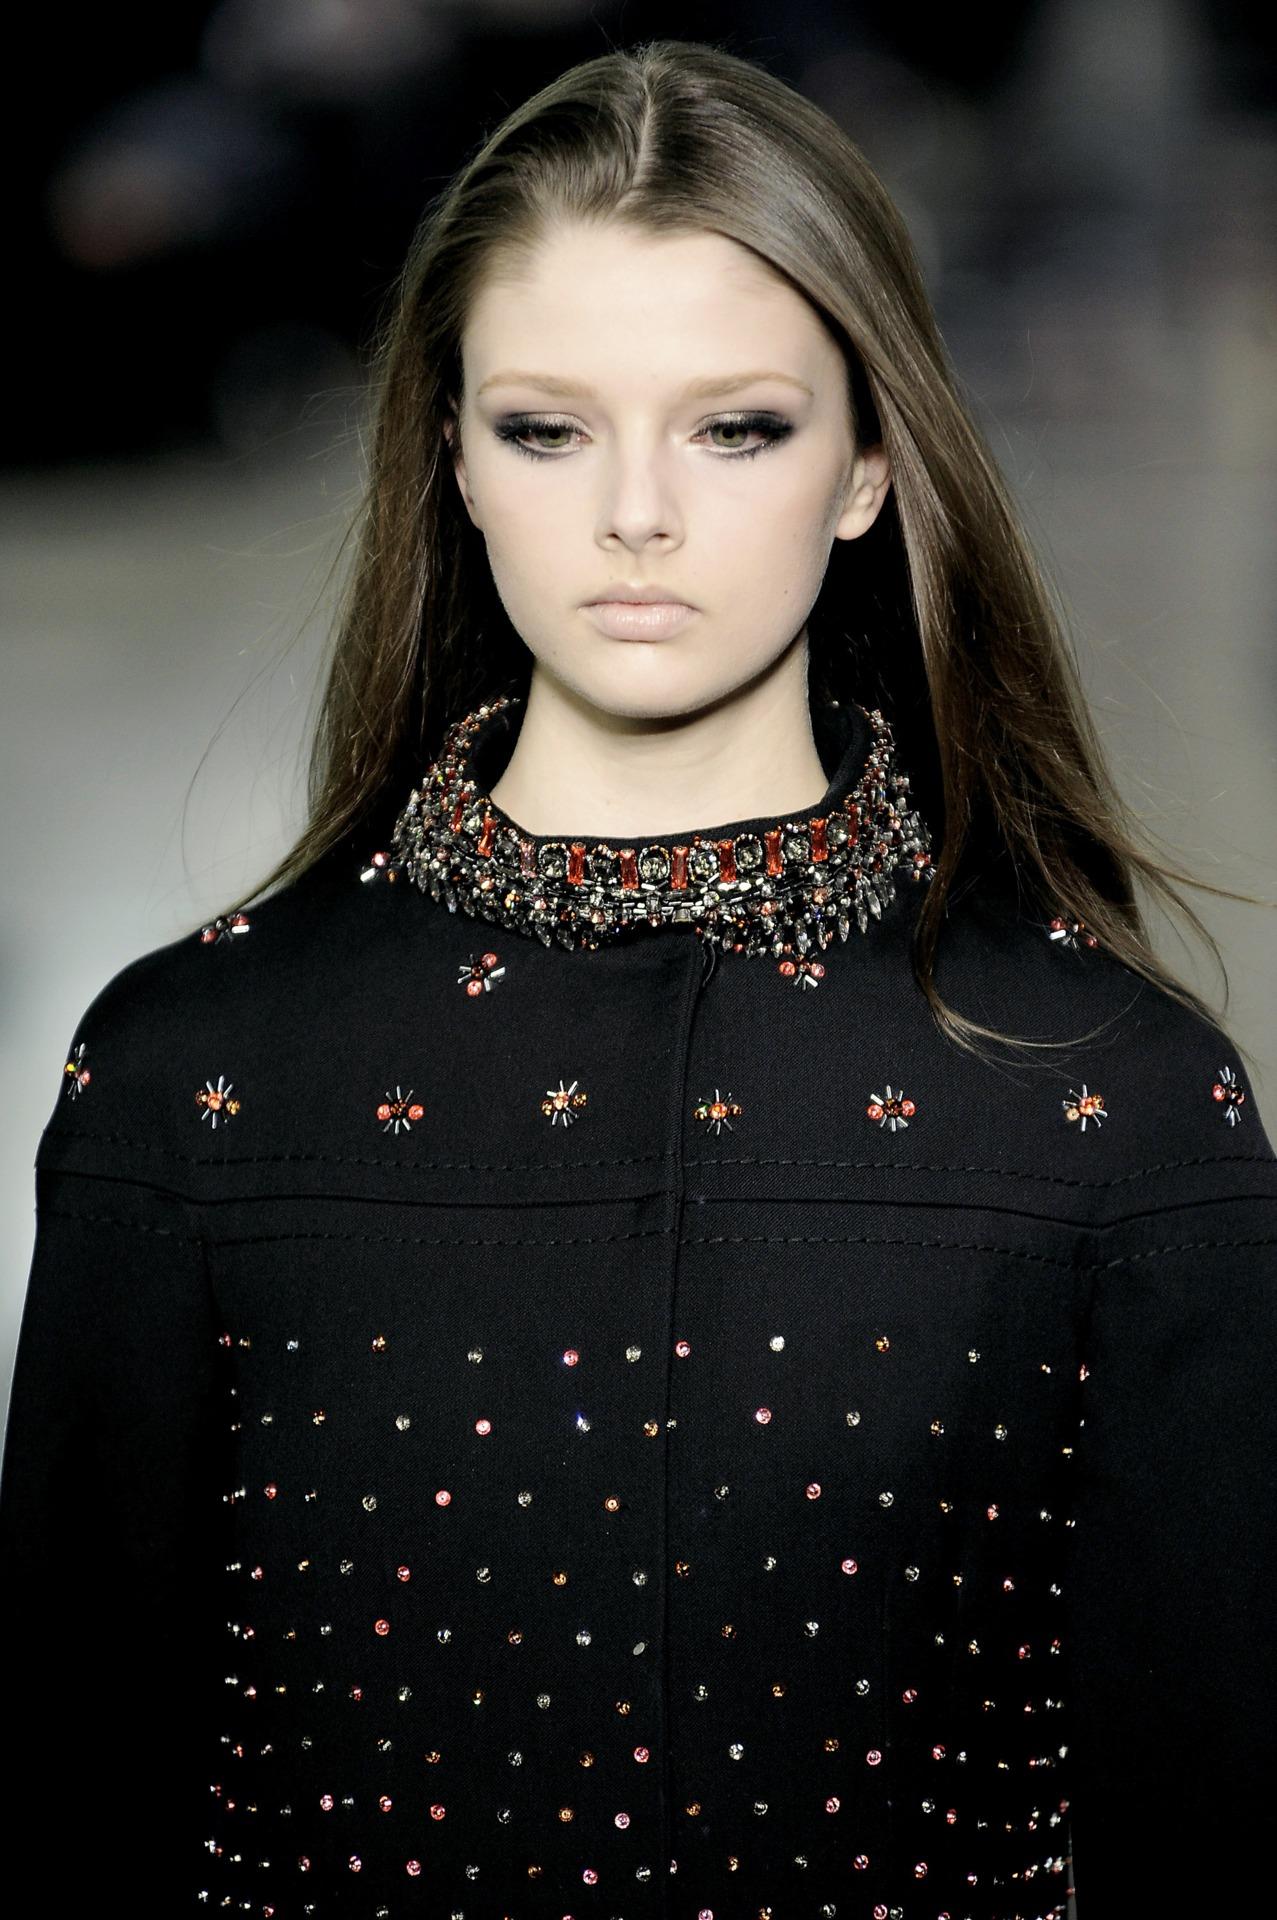 myprada: fashion&models